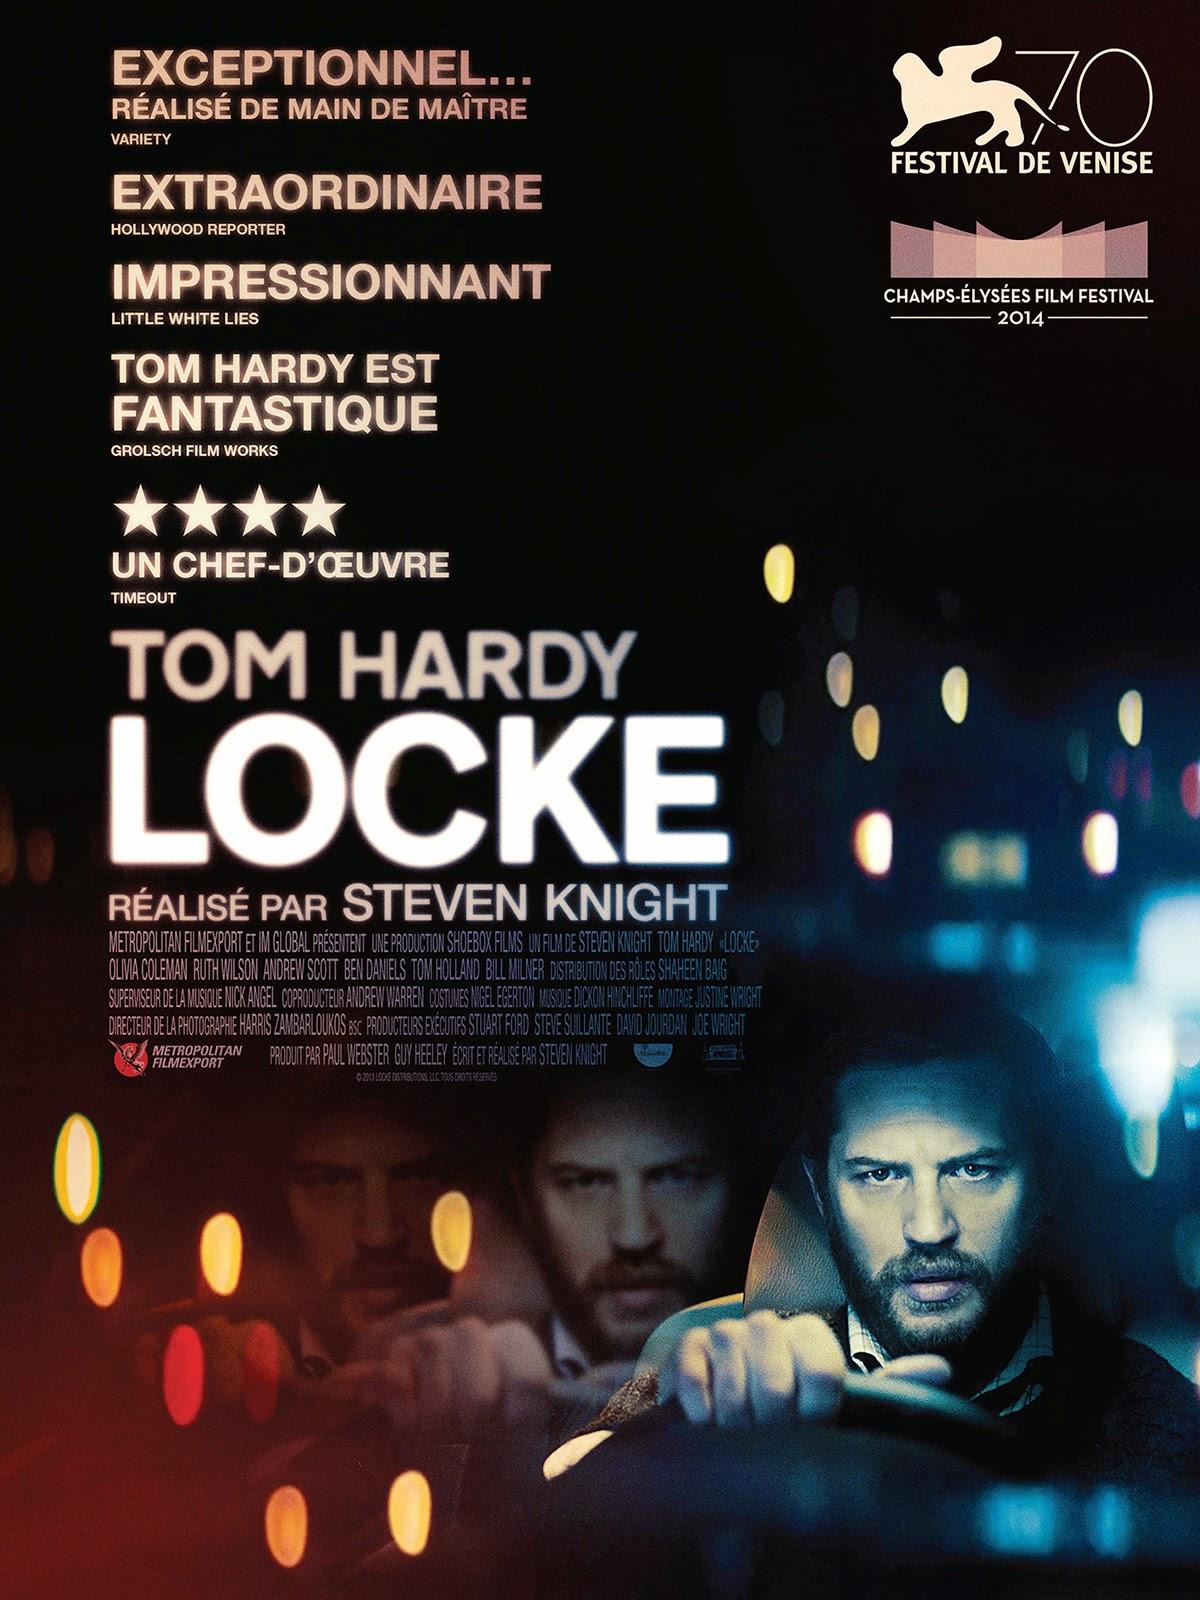 http://fuckingcinephiles.blogspot.fr/2014/07/critique-locke.html